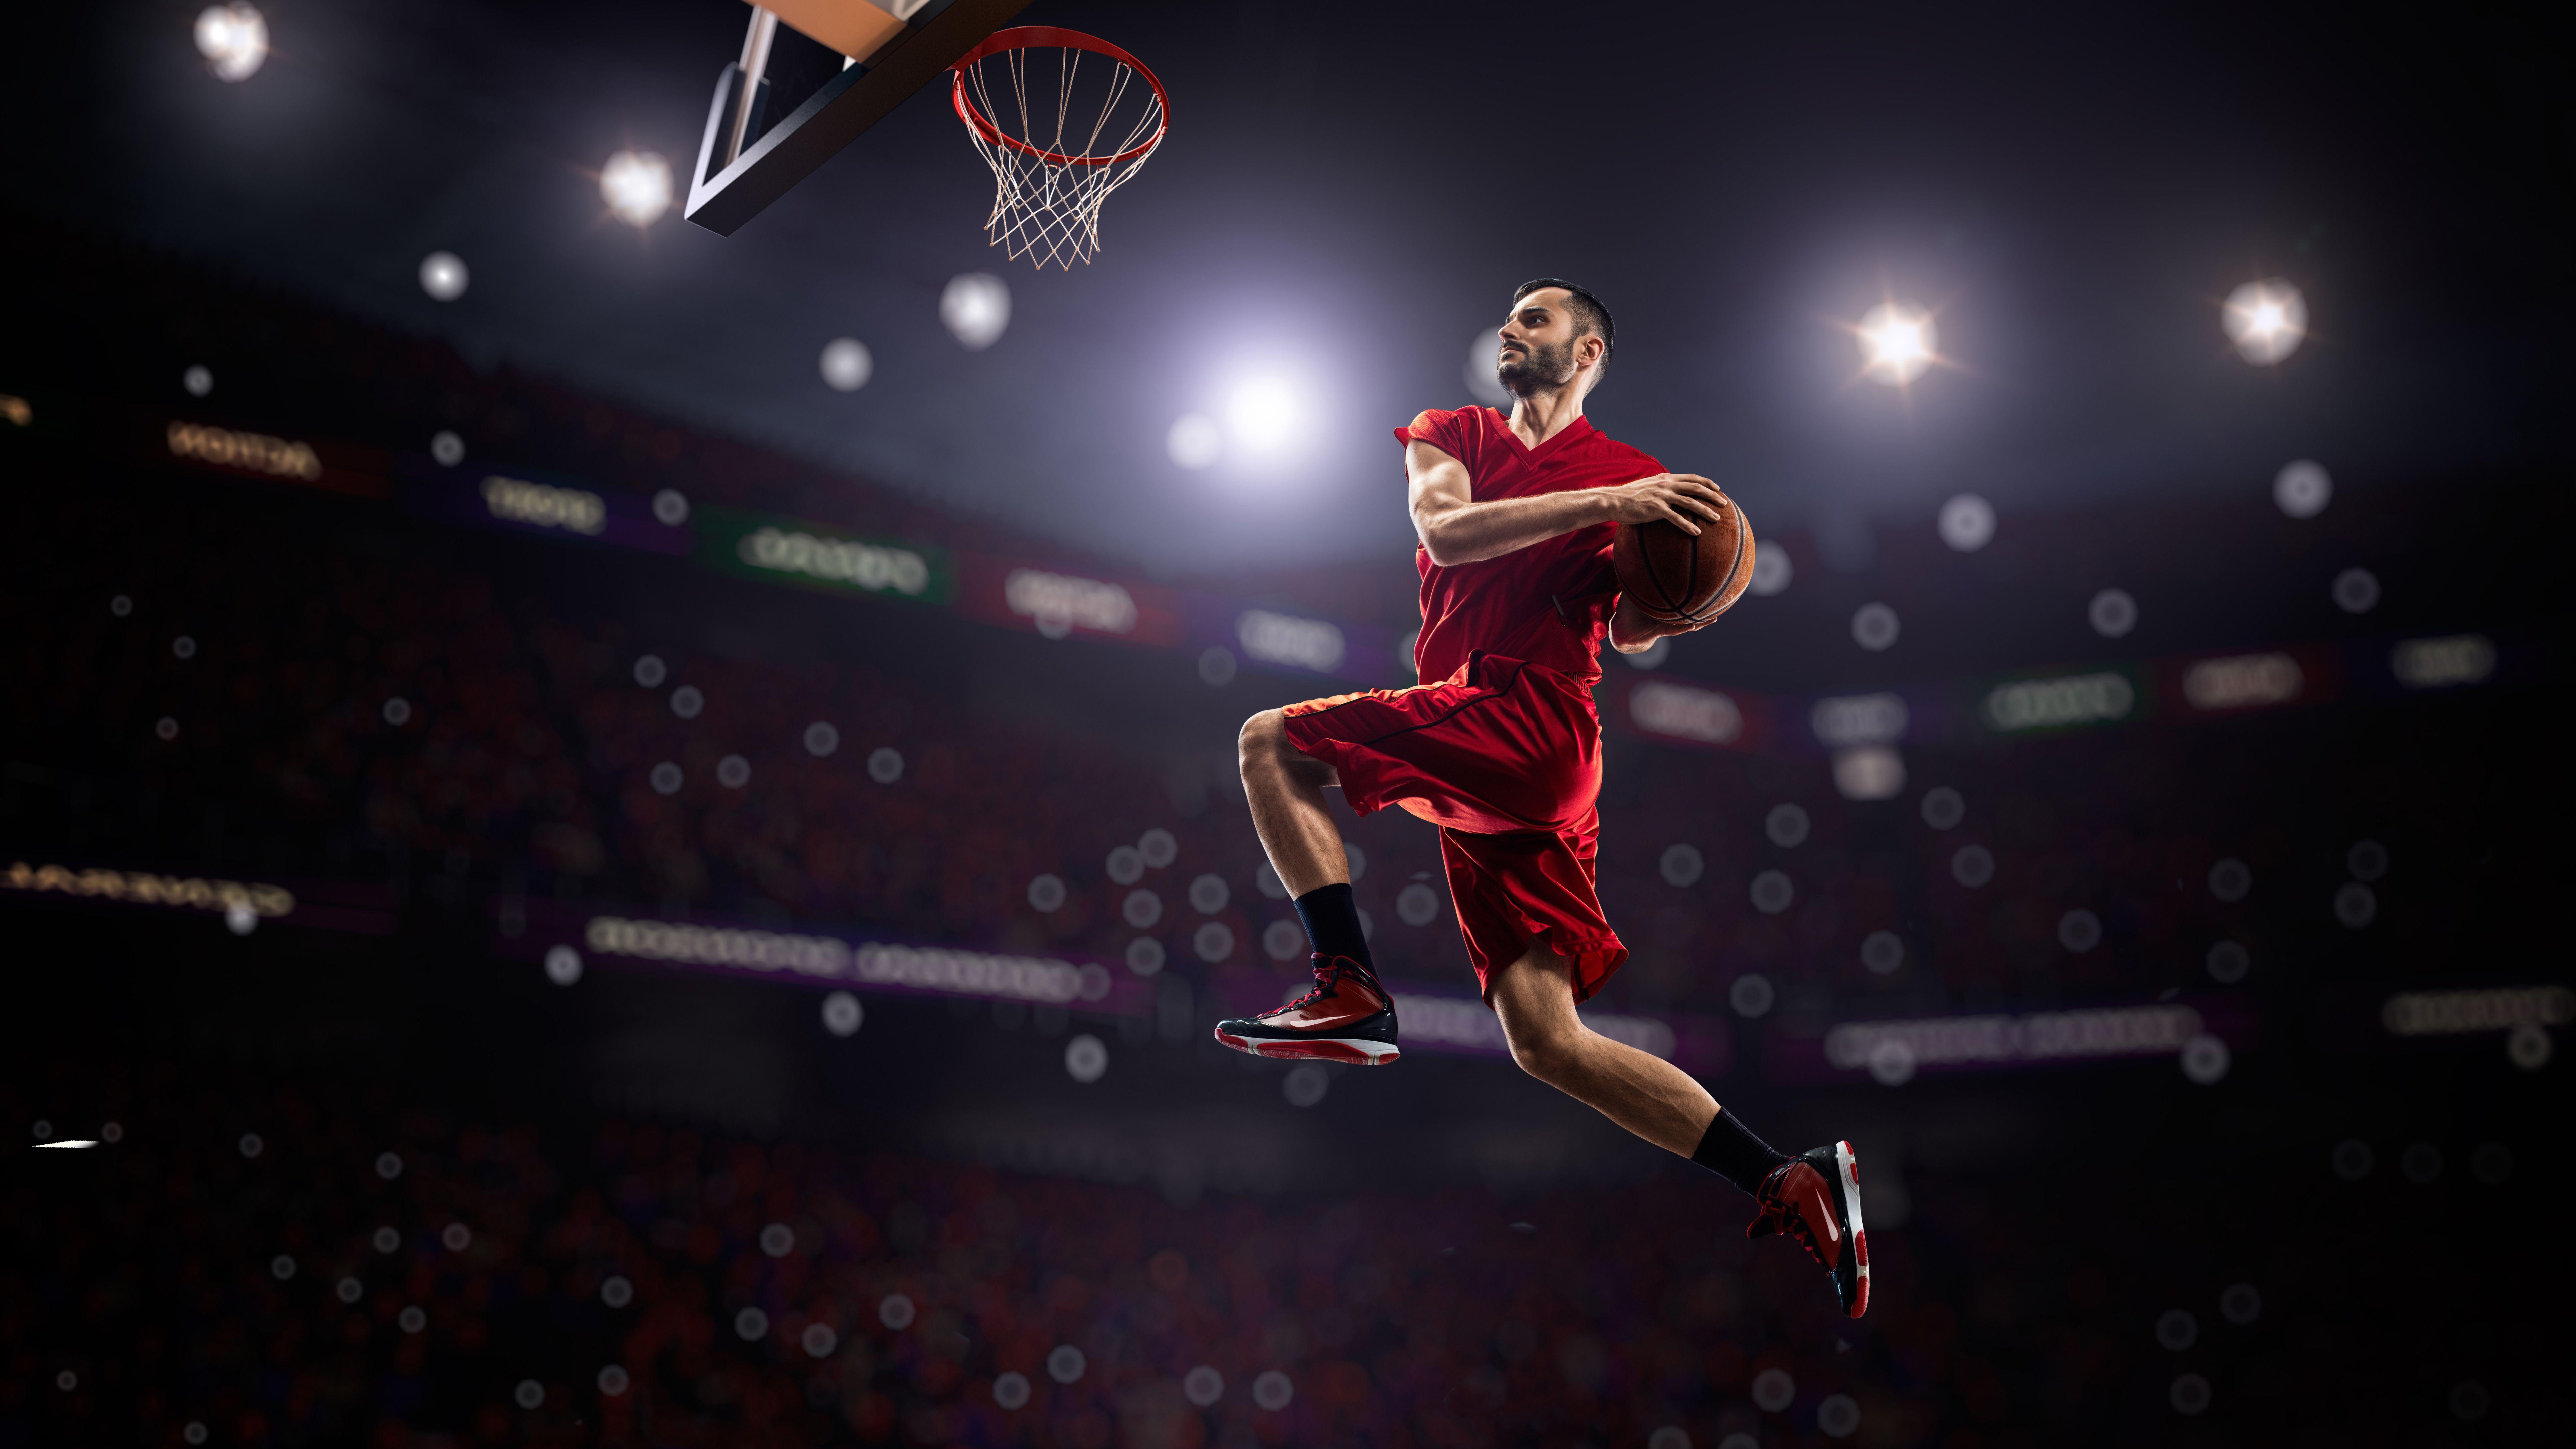 4K Basketball Wallpapers   Top 4K Basketball Backgrounds 7680x4320